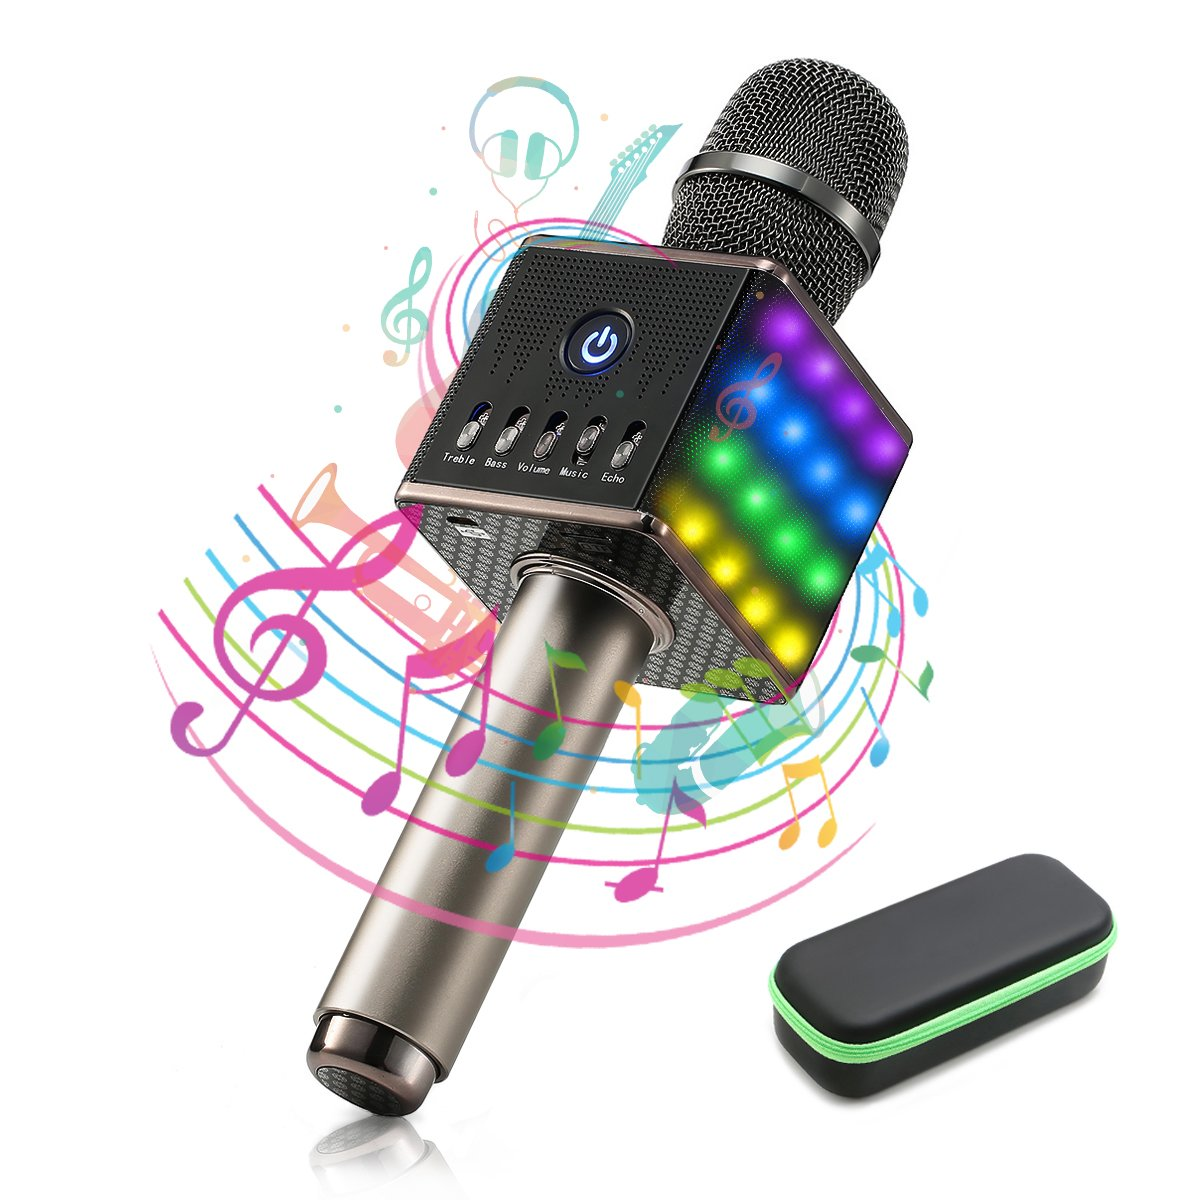 NASUM LED Wireless Karaoke Microphone, Handheld Cellphone Karaoke Player,H8 Karaoke Mic Built in Bluetooth Speaker,Karaoke MIC Machine for Home KTV with Carry Case,2600mAh,Black